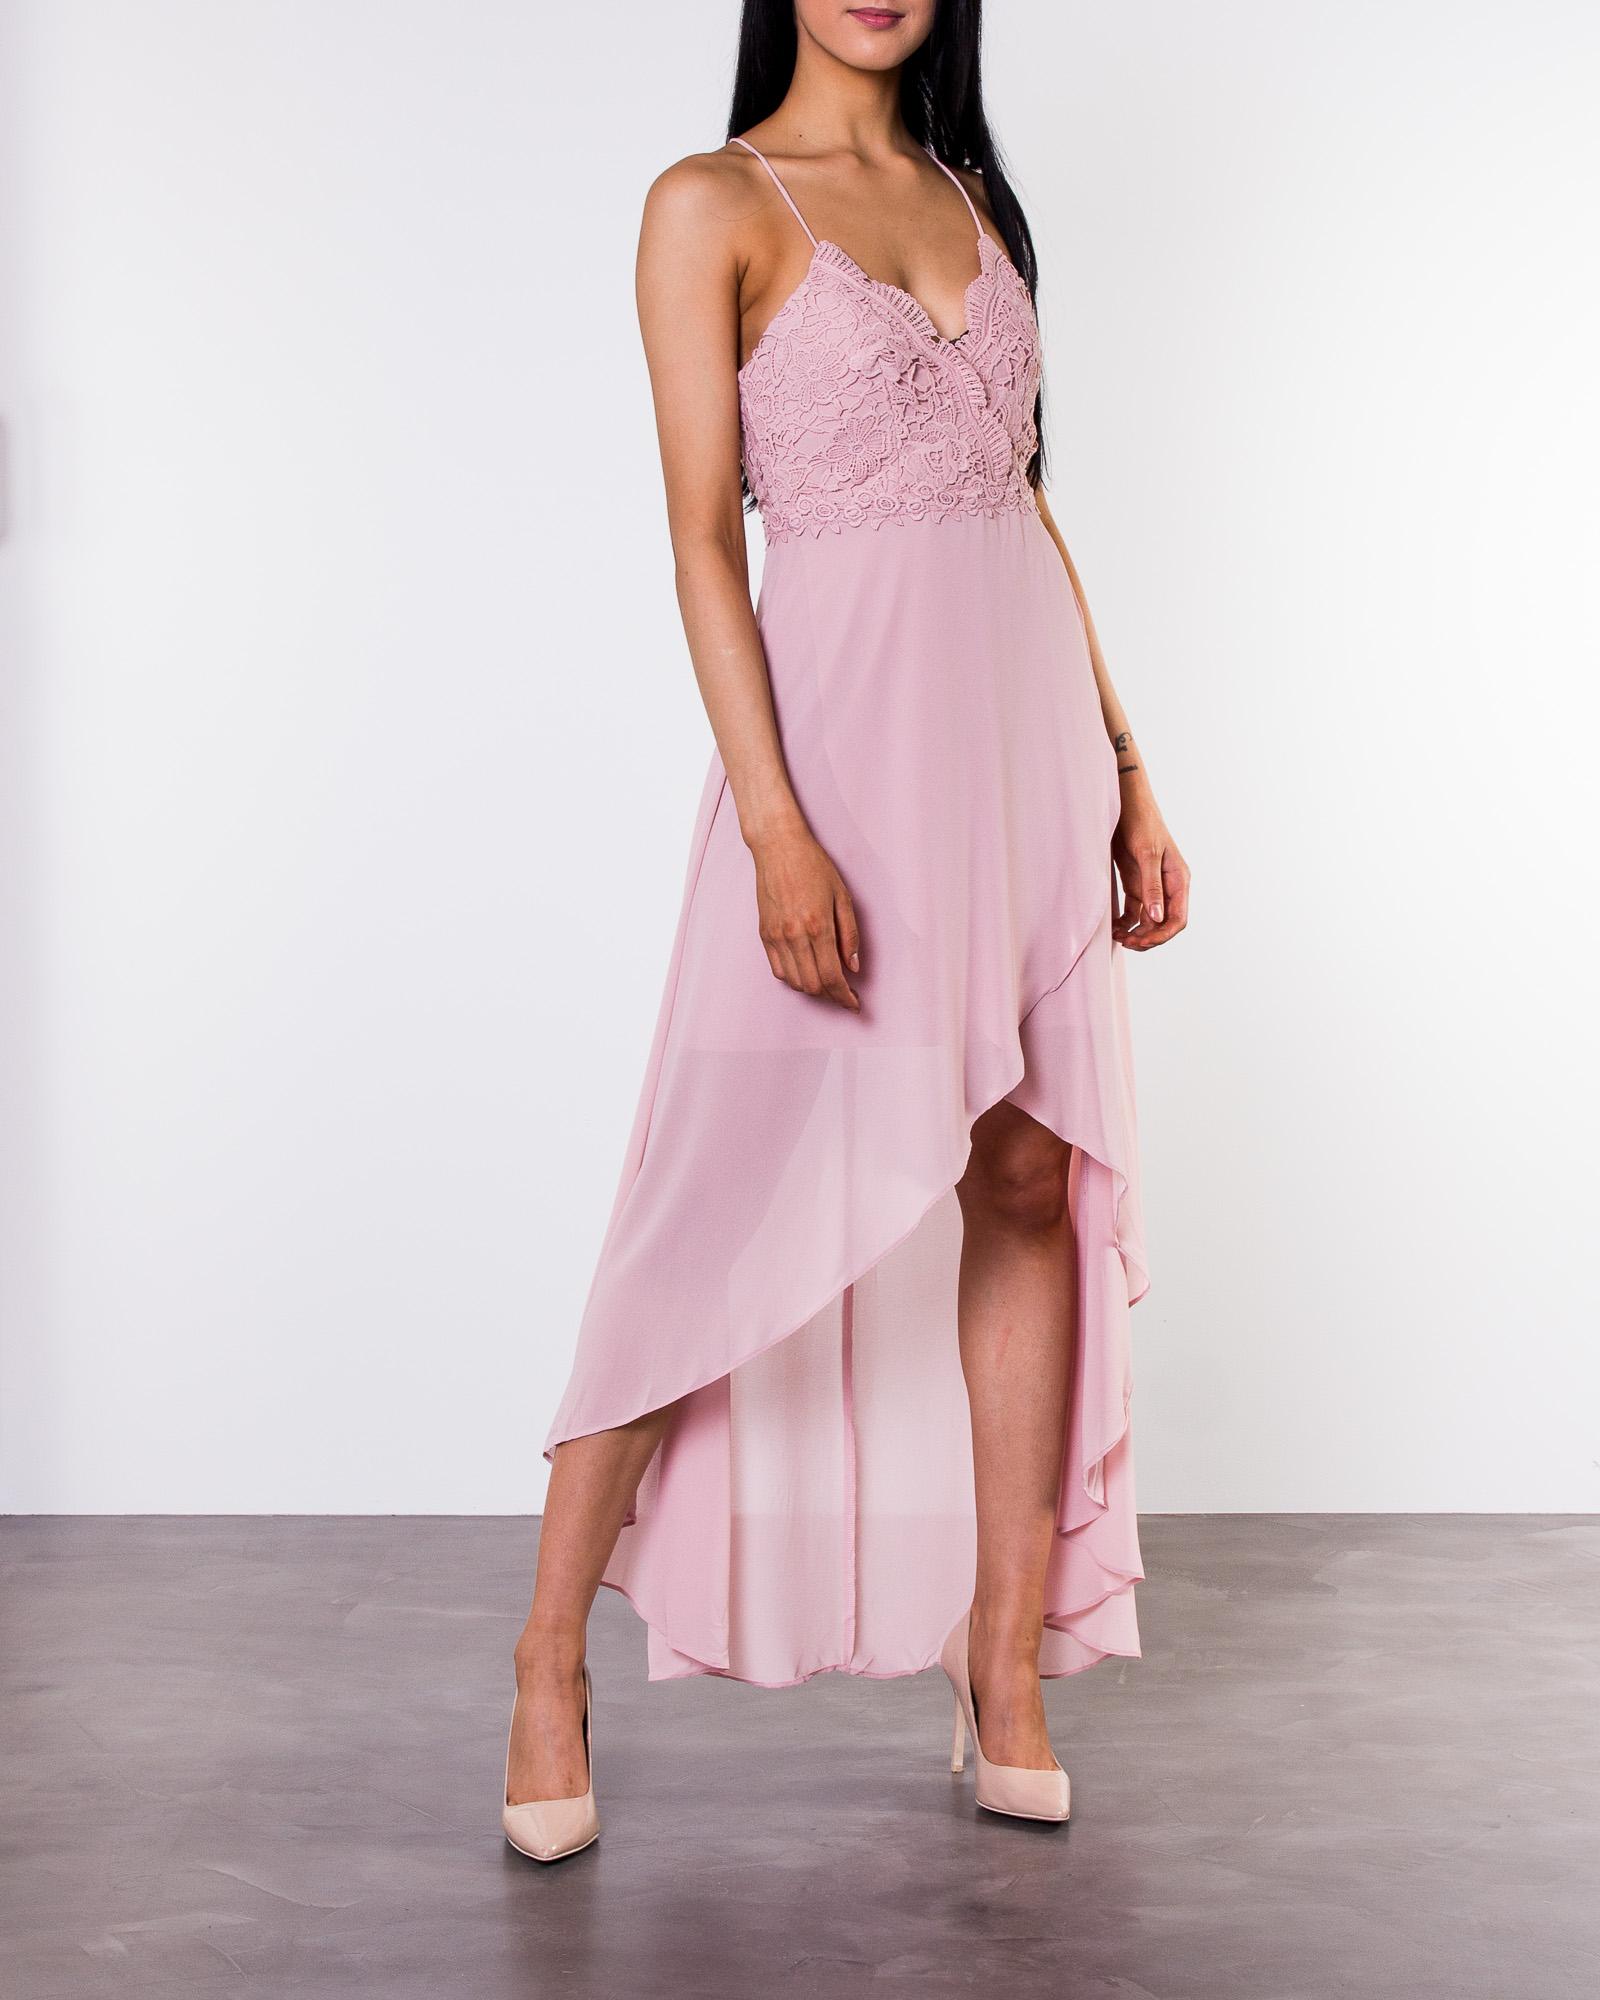 34348a7c Chiara Forthi, Ofelia Crochet Dress Pink   Women's Evening dresses    HOUSEOFBRANDON.COM